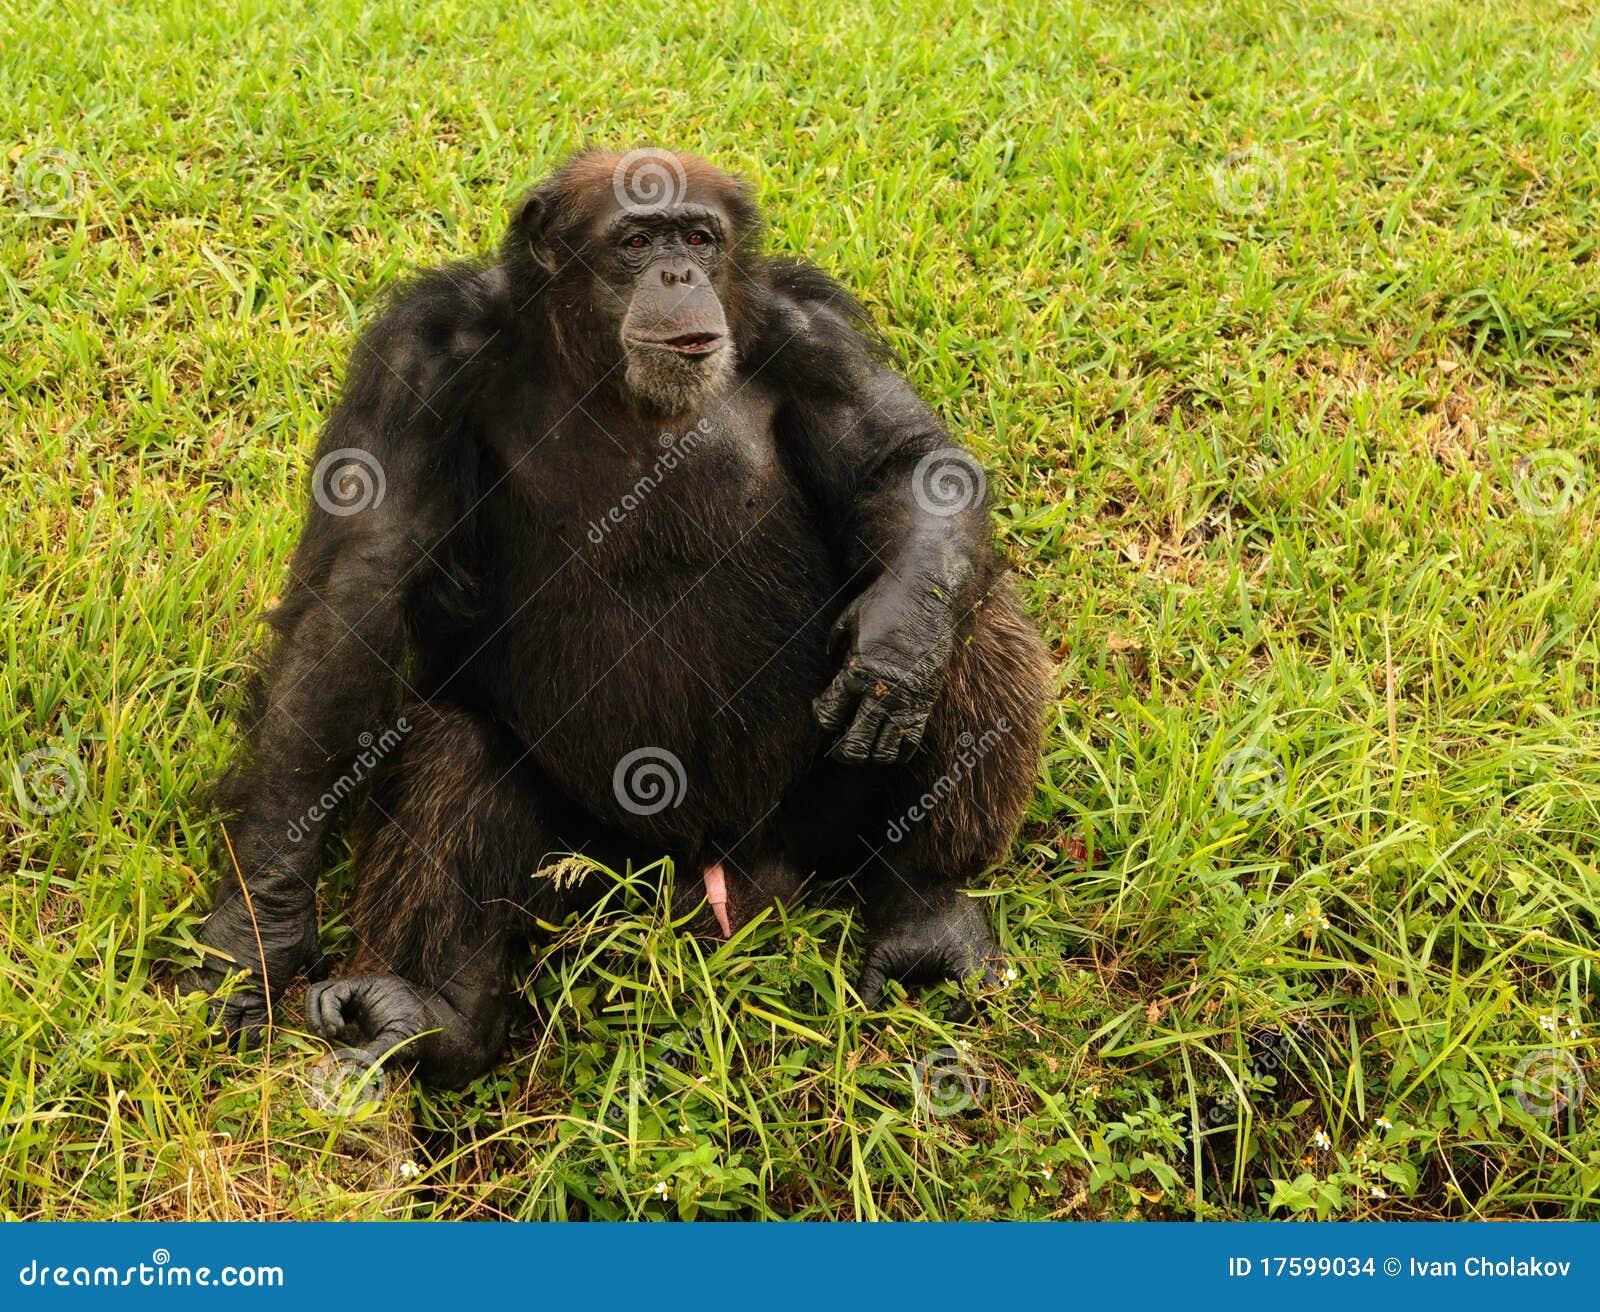 Sitting Chimp Royalty Free Stock Photo - Image: 32035435  |Chimp Sitting